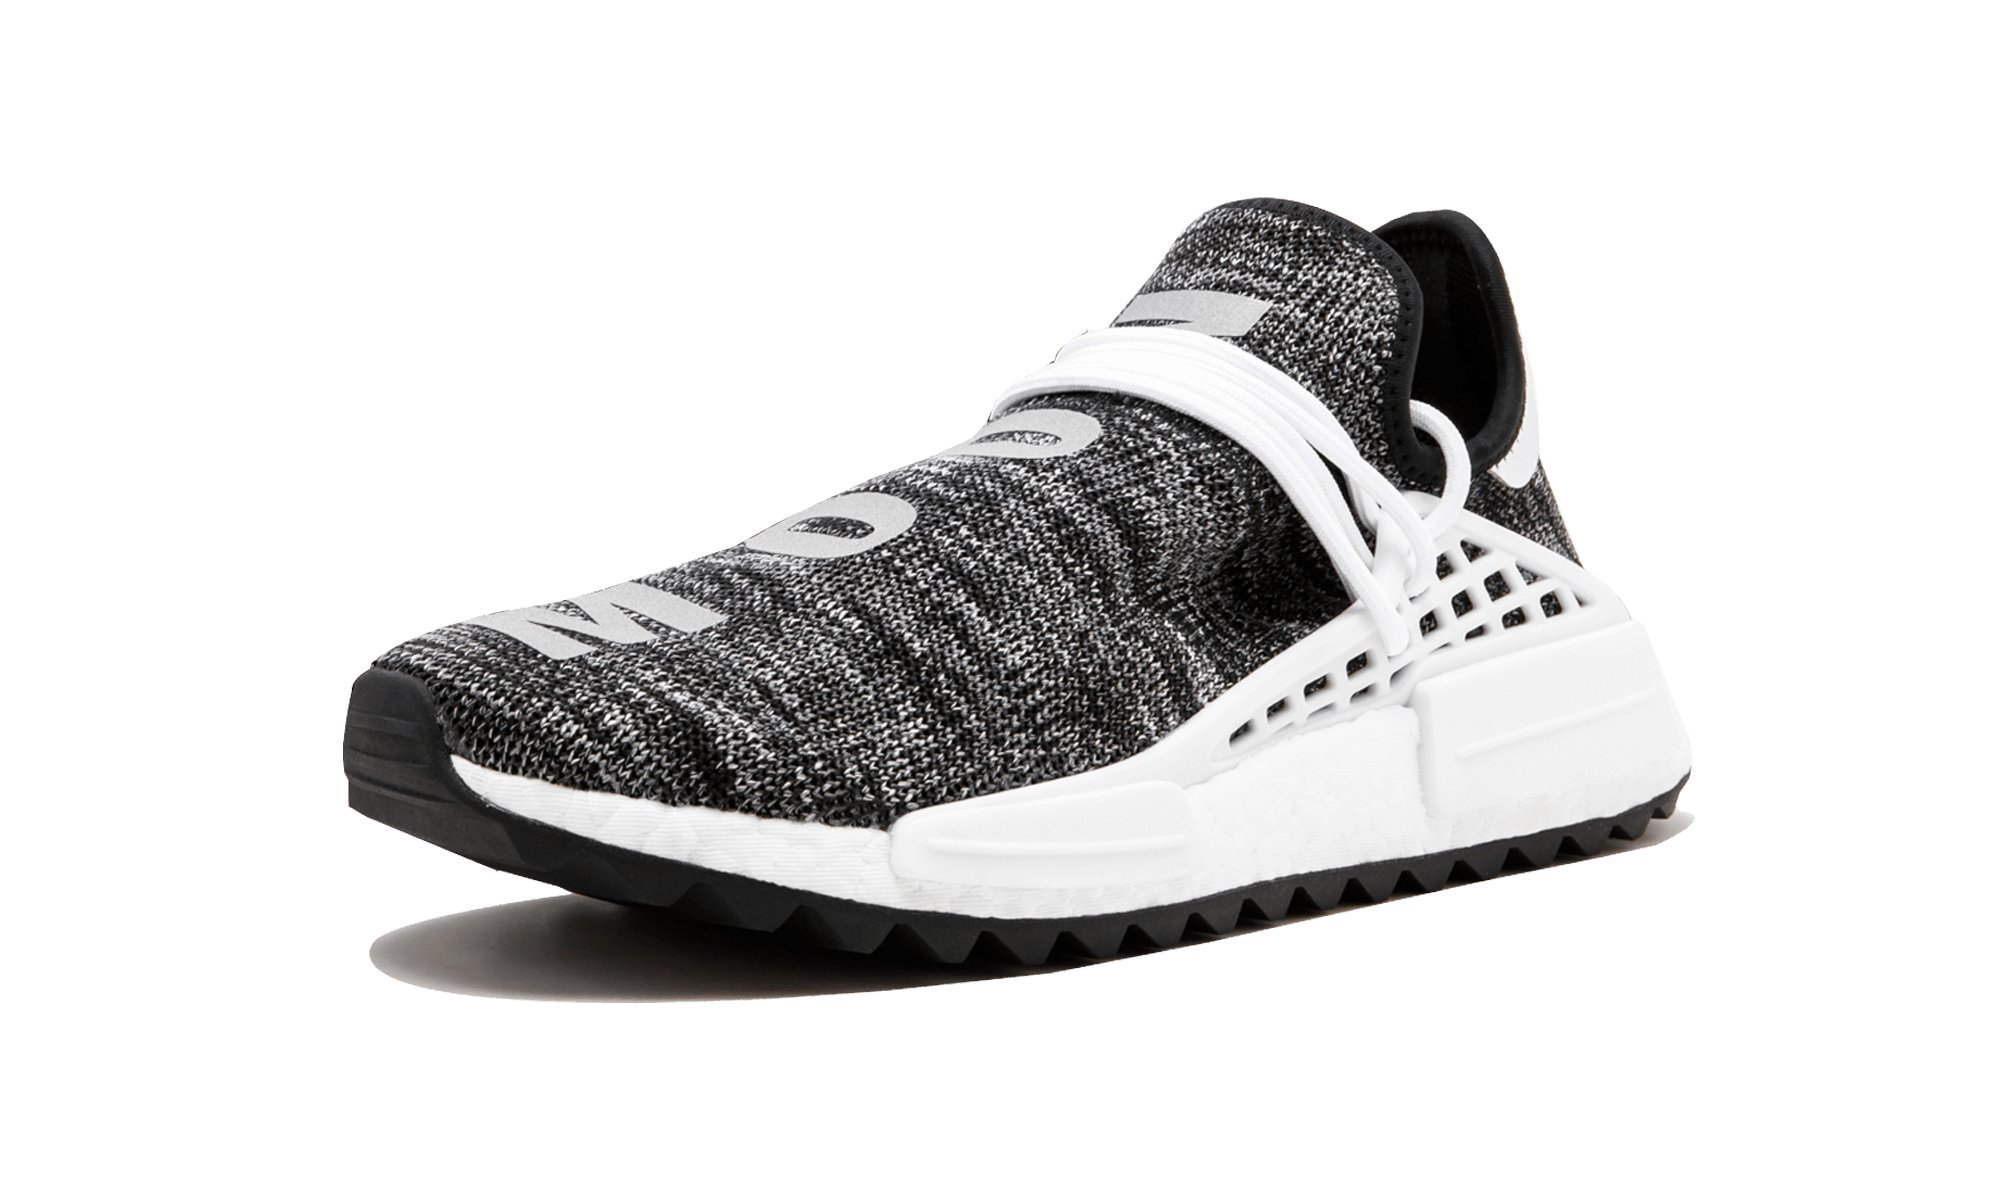 28fb1b0d81d03 adidas Originals PW Human Race NMD Trail Shoe - Men s Hiking 10 Core Black  White